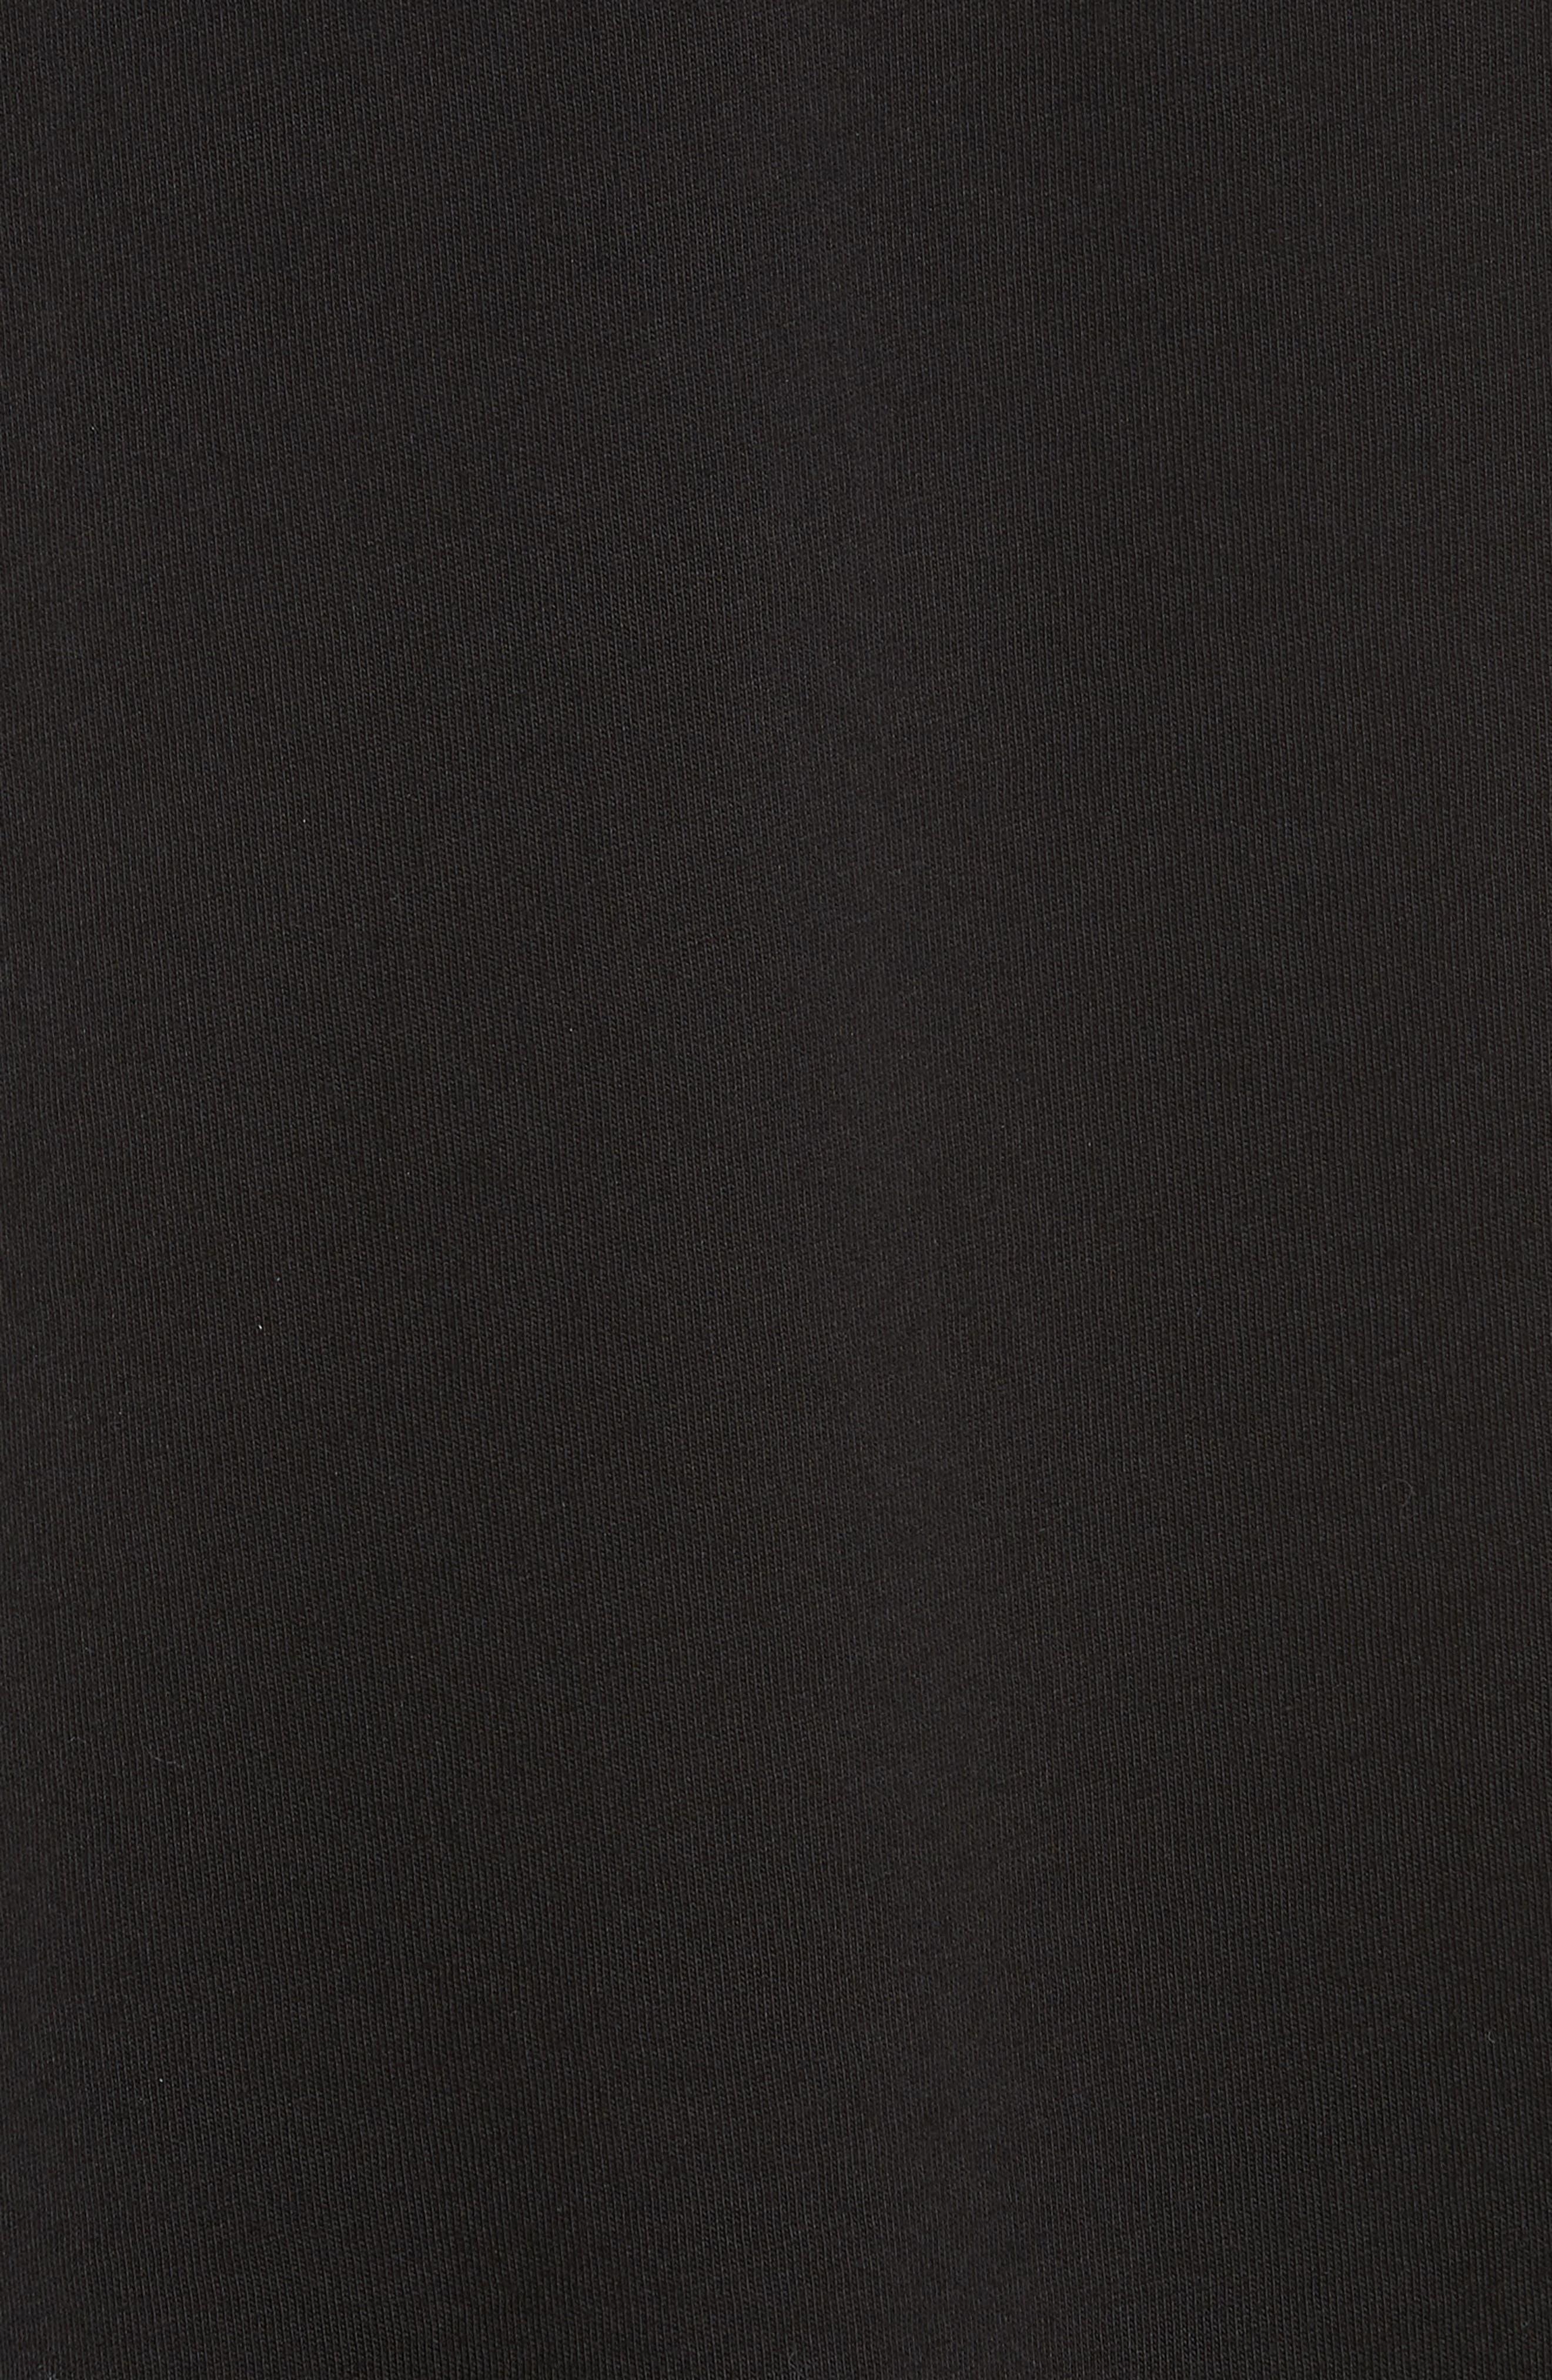 Pleat Accent Crewneck Long Sleeve Top,                             Alternate thumbnail 5, color,                             BLACK/ BLACK/ WHITE